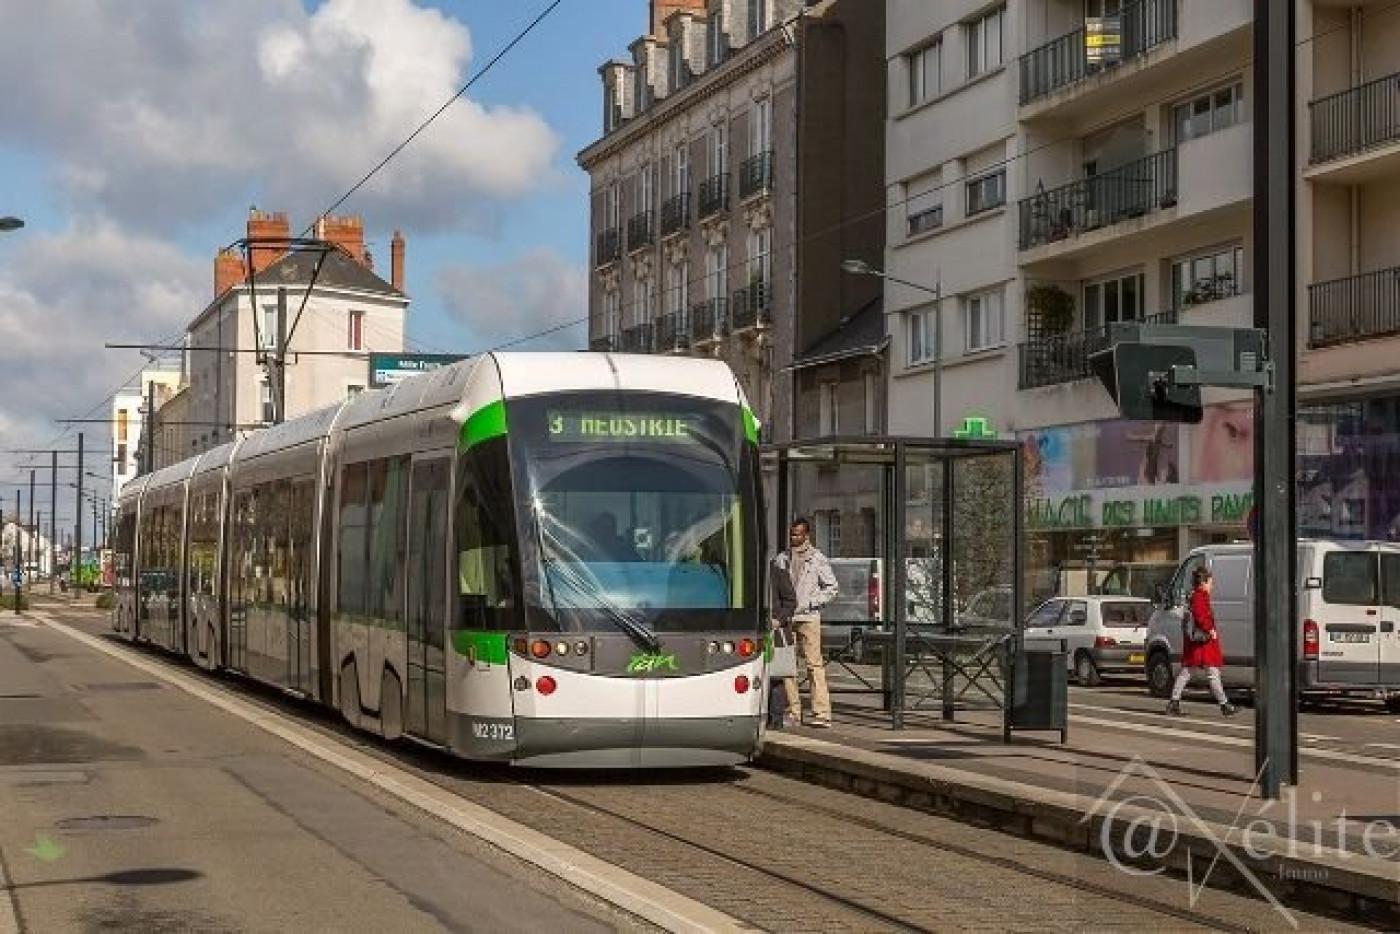 A vendre Nantes 777921208 Axelite sas